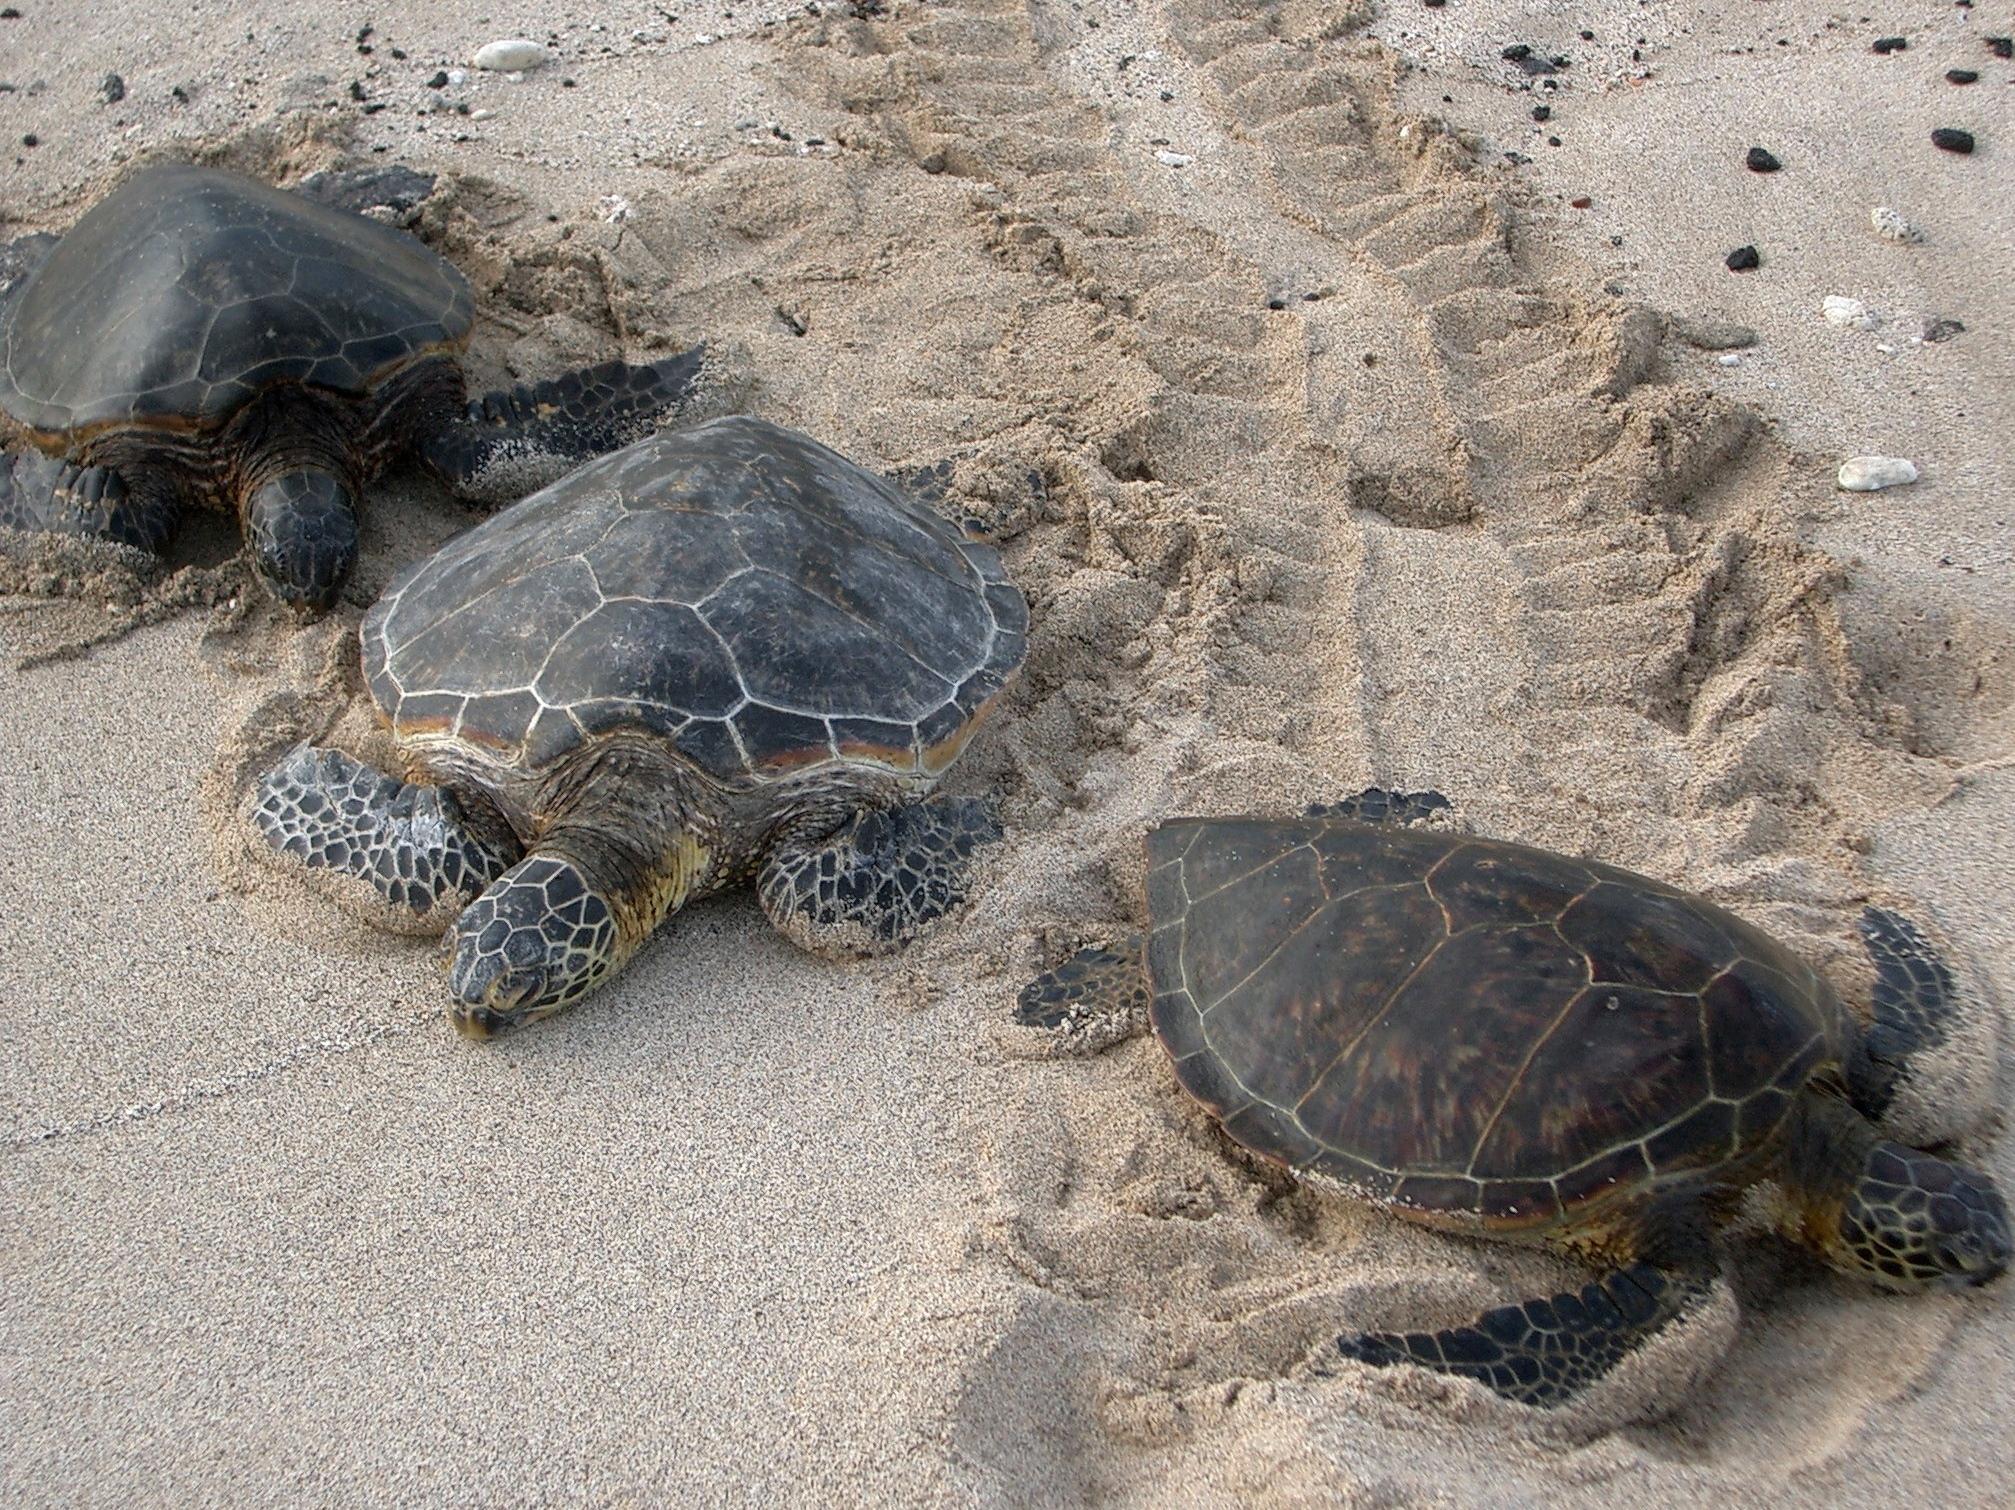 Sea Turtles in Georgia Sea Turtle Nesting Records in